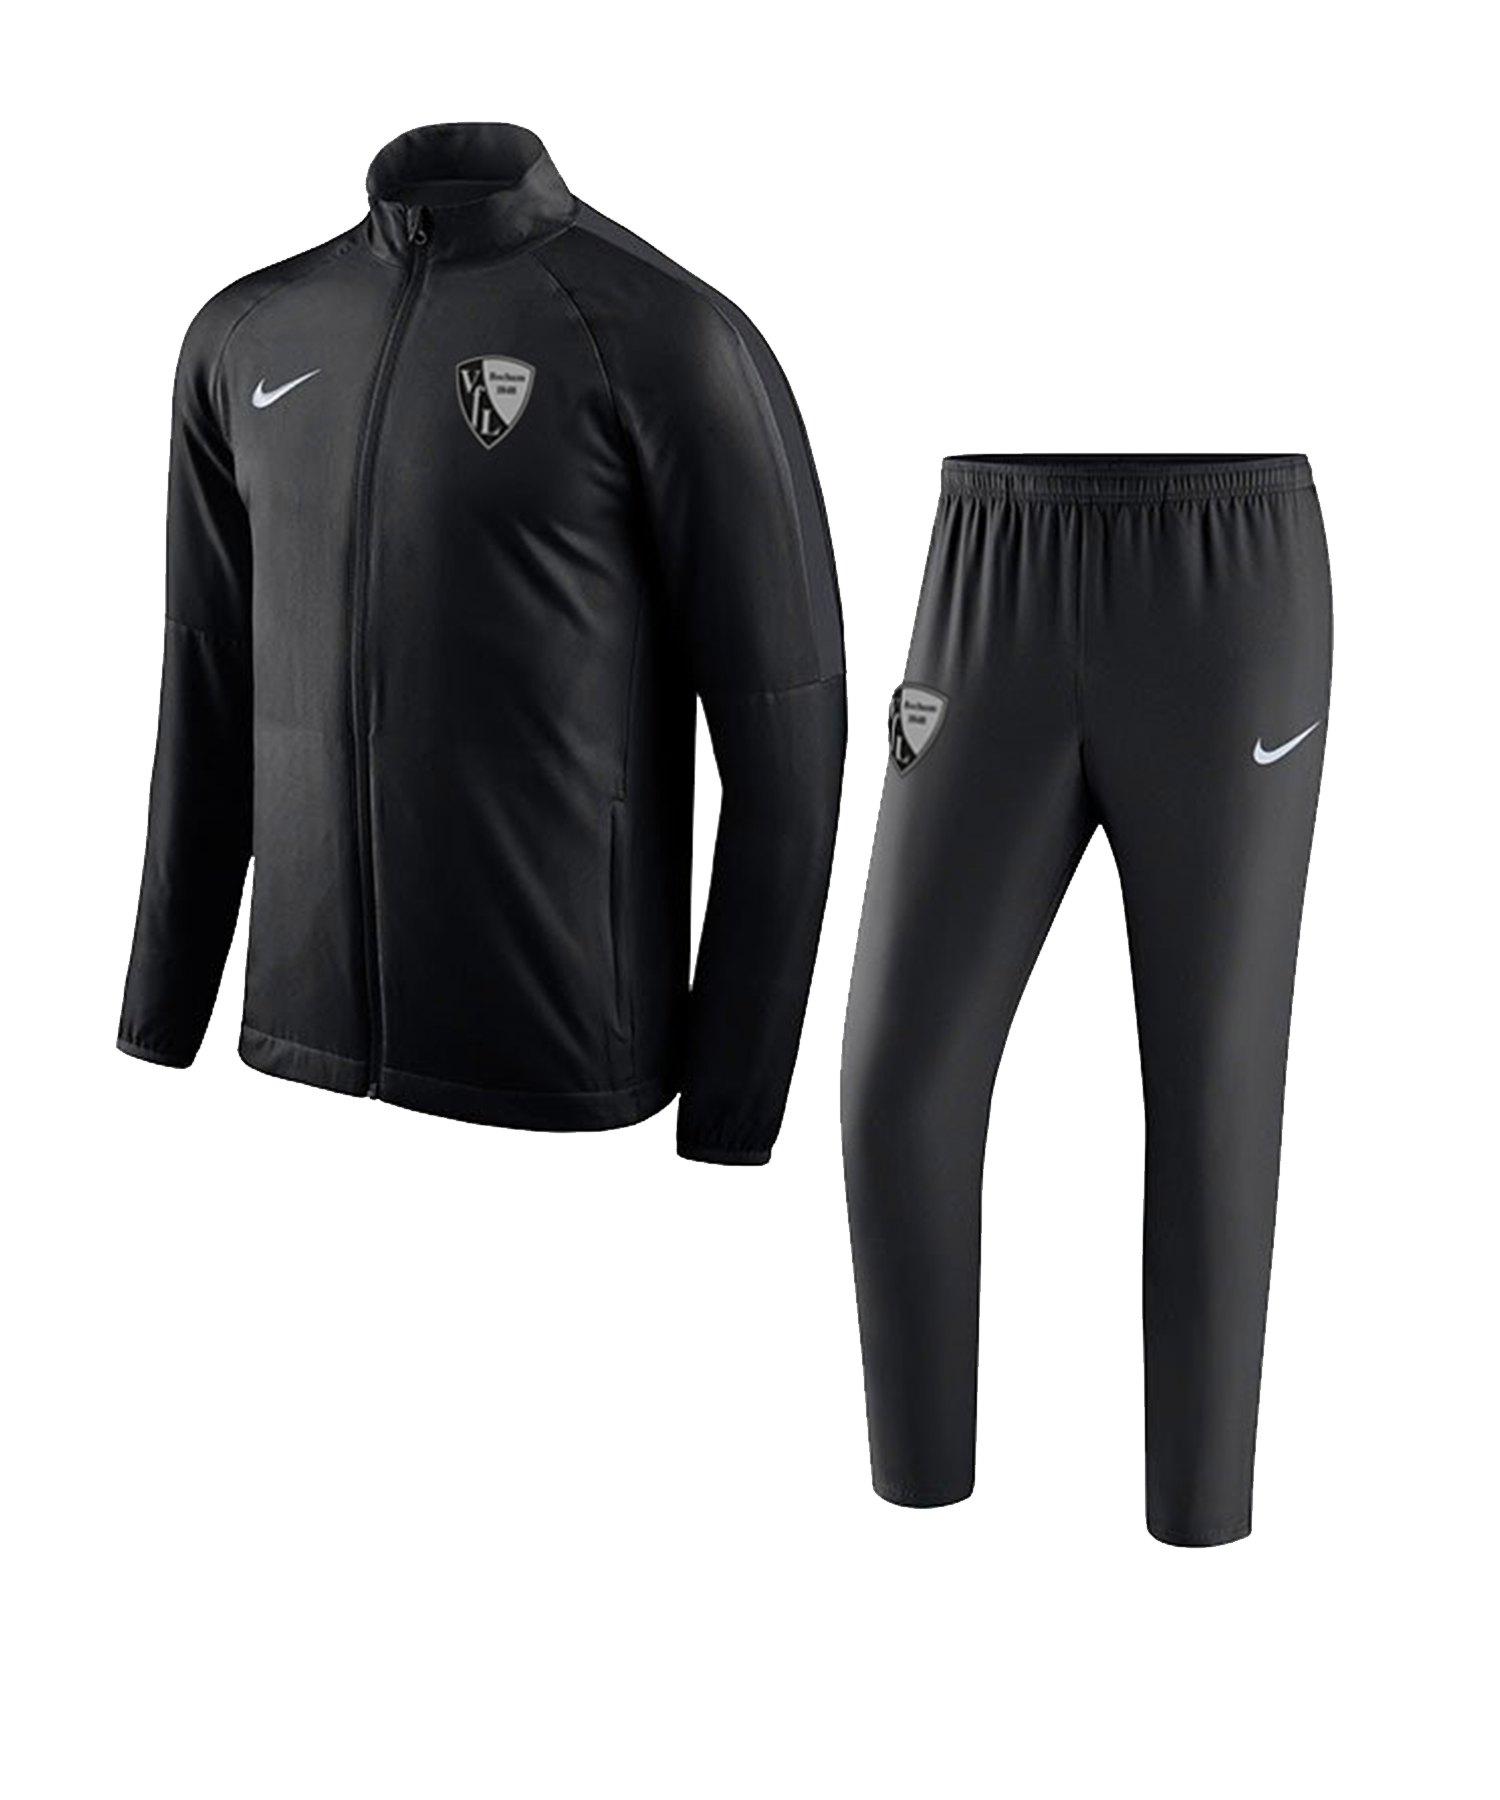 Nike VfL Bochum Trainingsanzug Schwarz F010 - schwarz